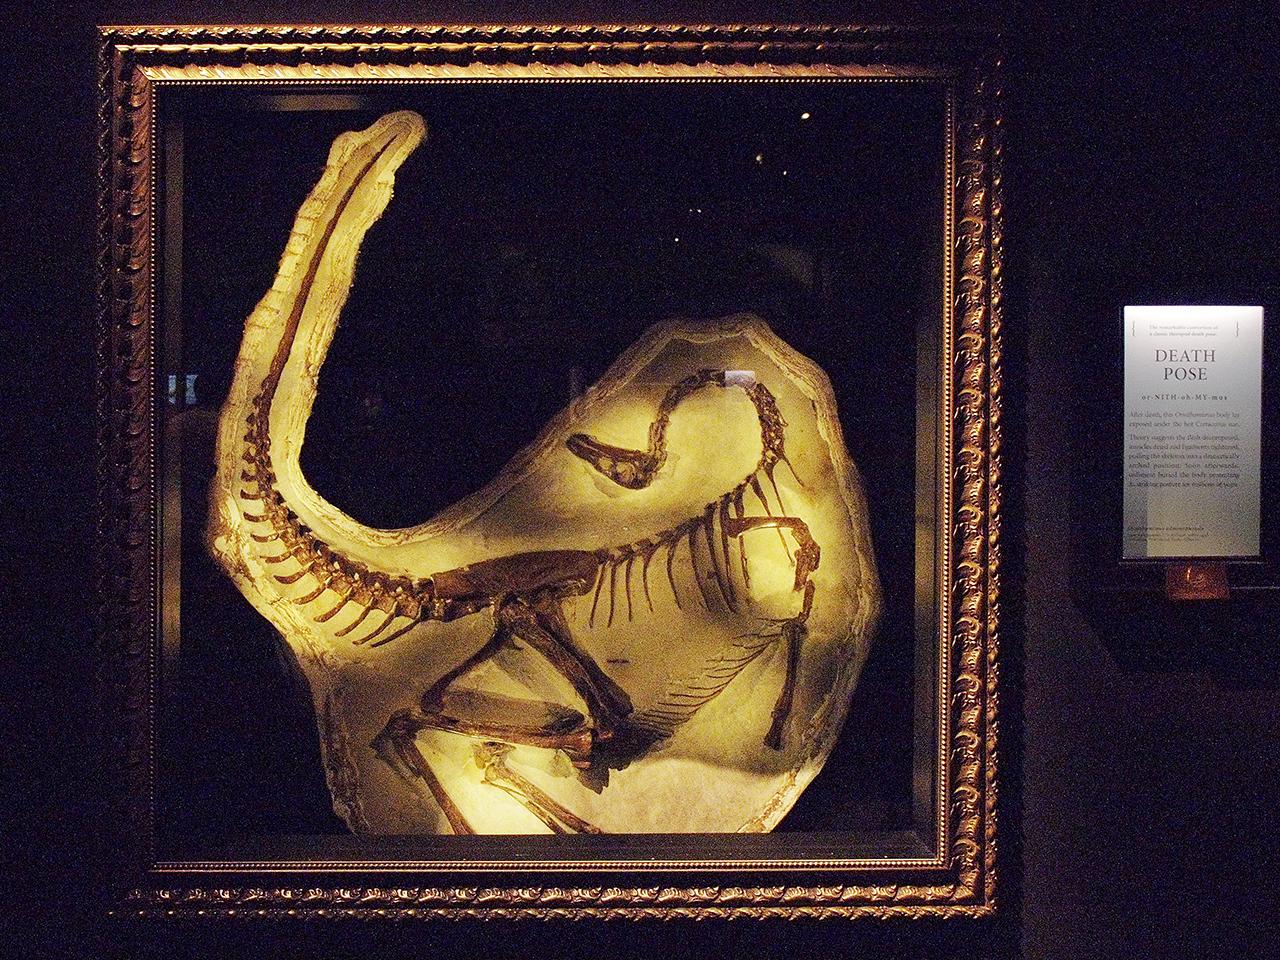 a small dinosaur skeleton in an ornate frame